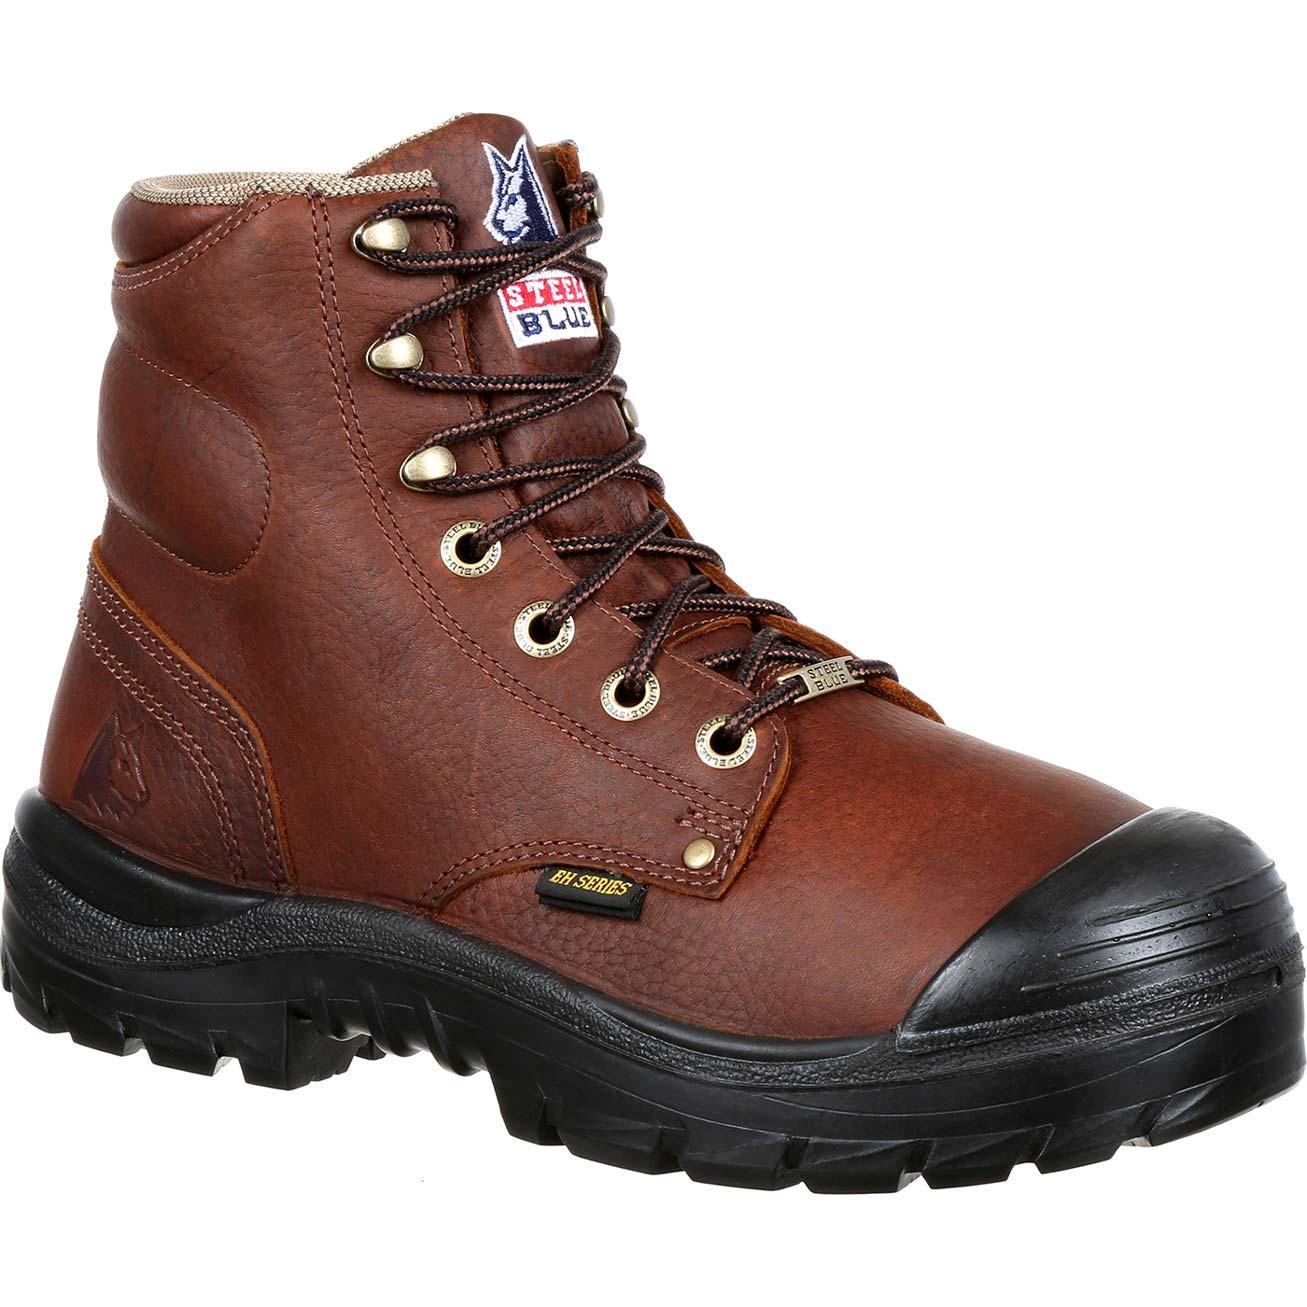 680c31cd49c6ca Steel Blue Argyle Bump Steel Toe Internal Met Guard Work Boot, ST832912